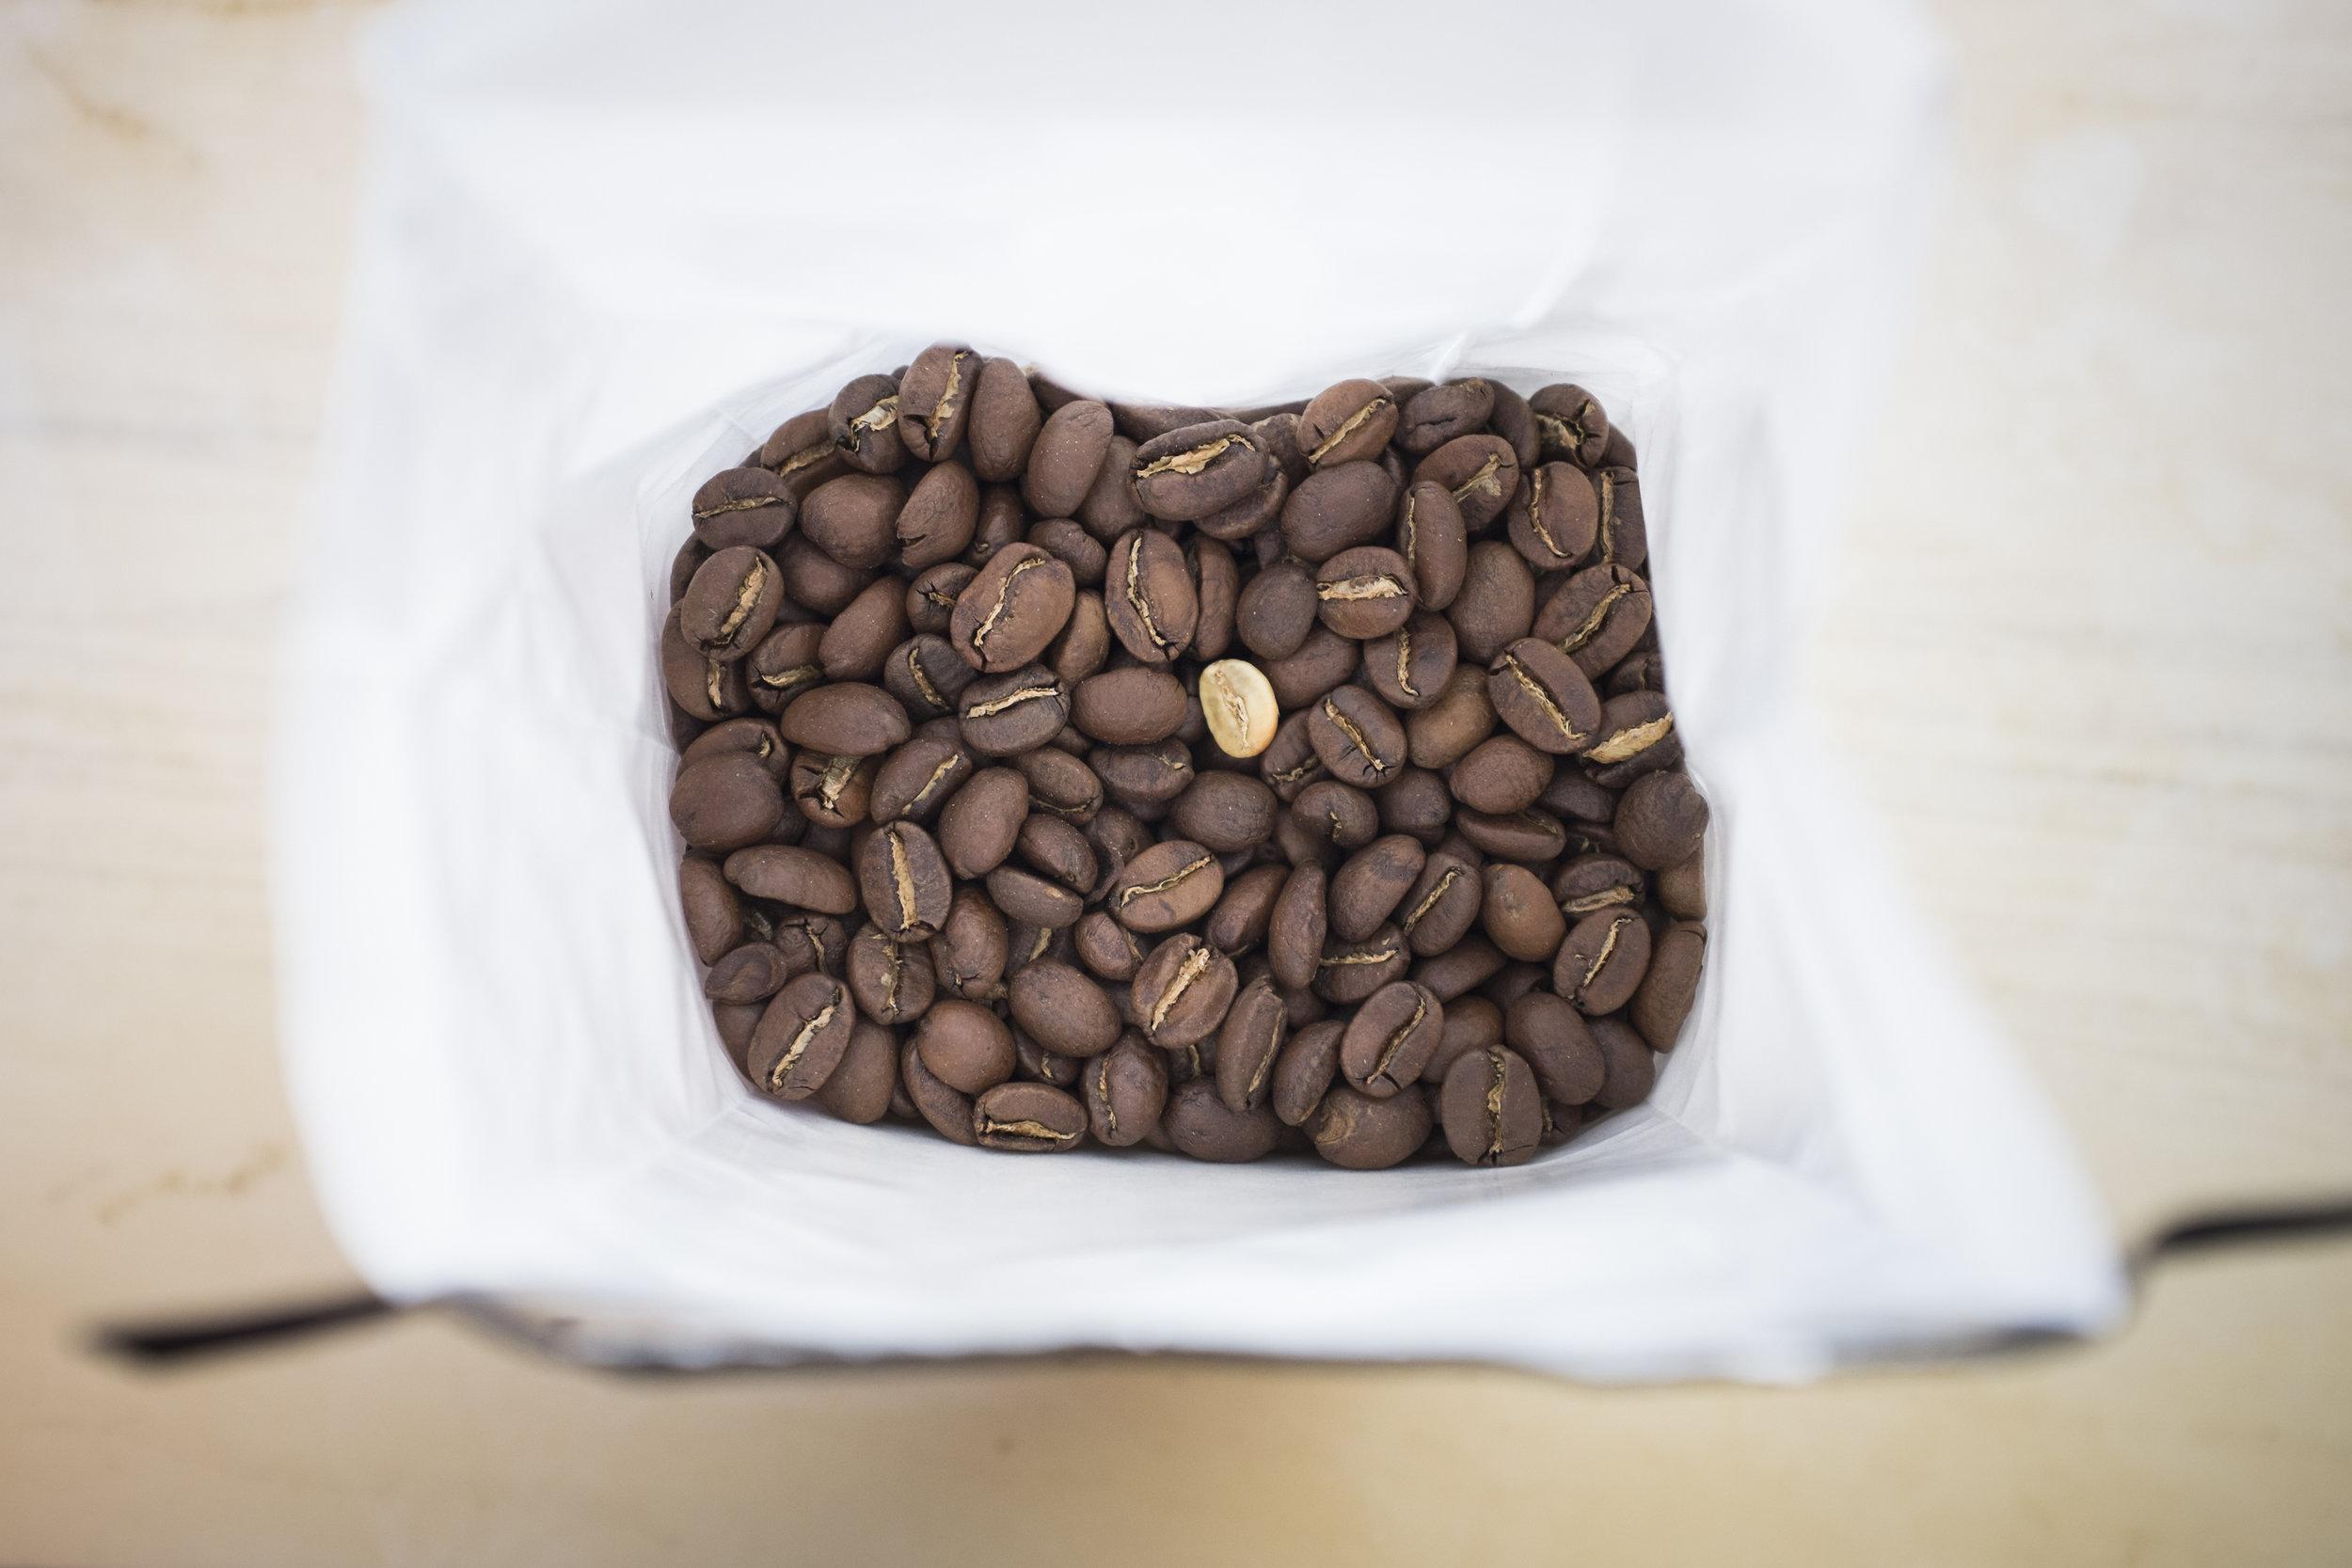 021617_coffee_007.JPG